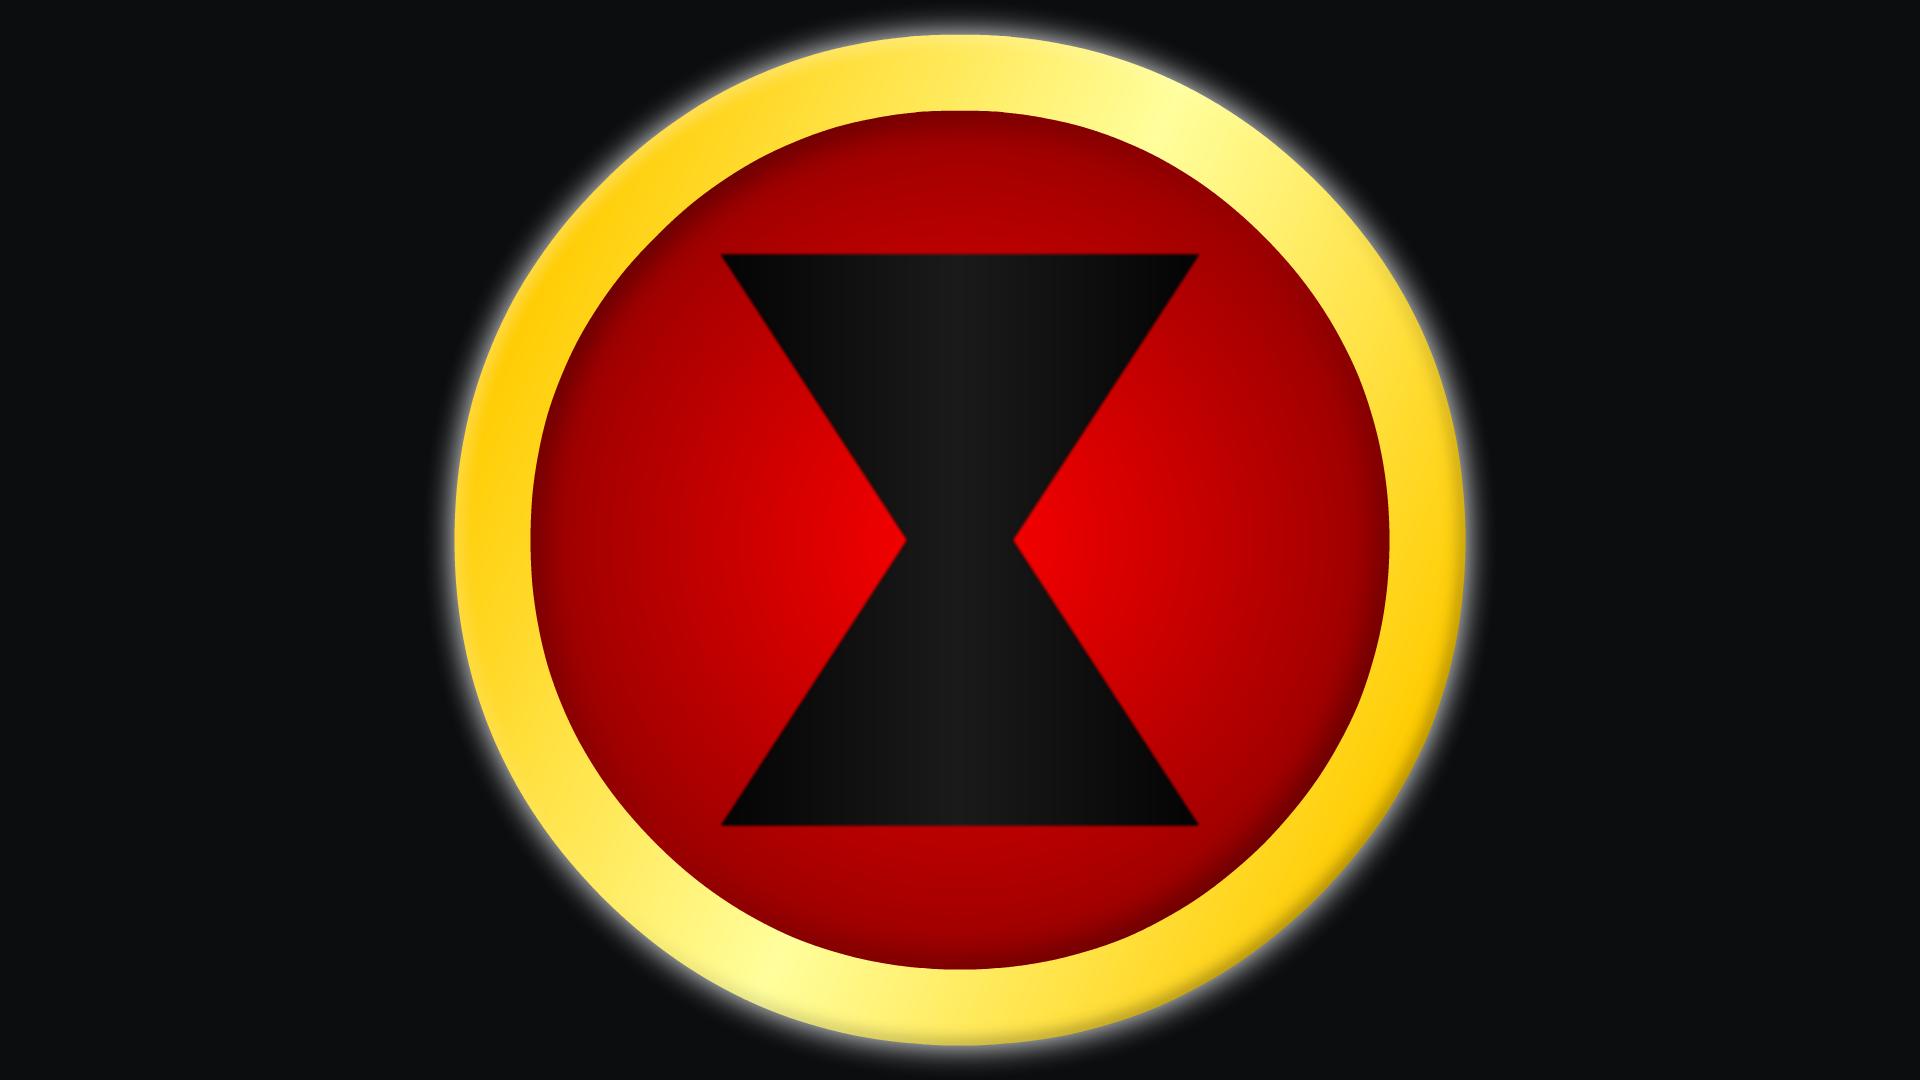 Avengers Black Widow Symbol Anazhthsh Google Black Widow Marvel Black Widow Symbol Avengers Symbols